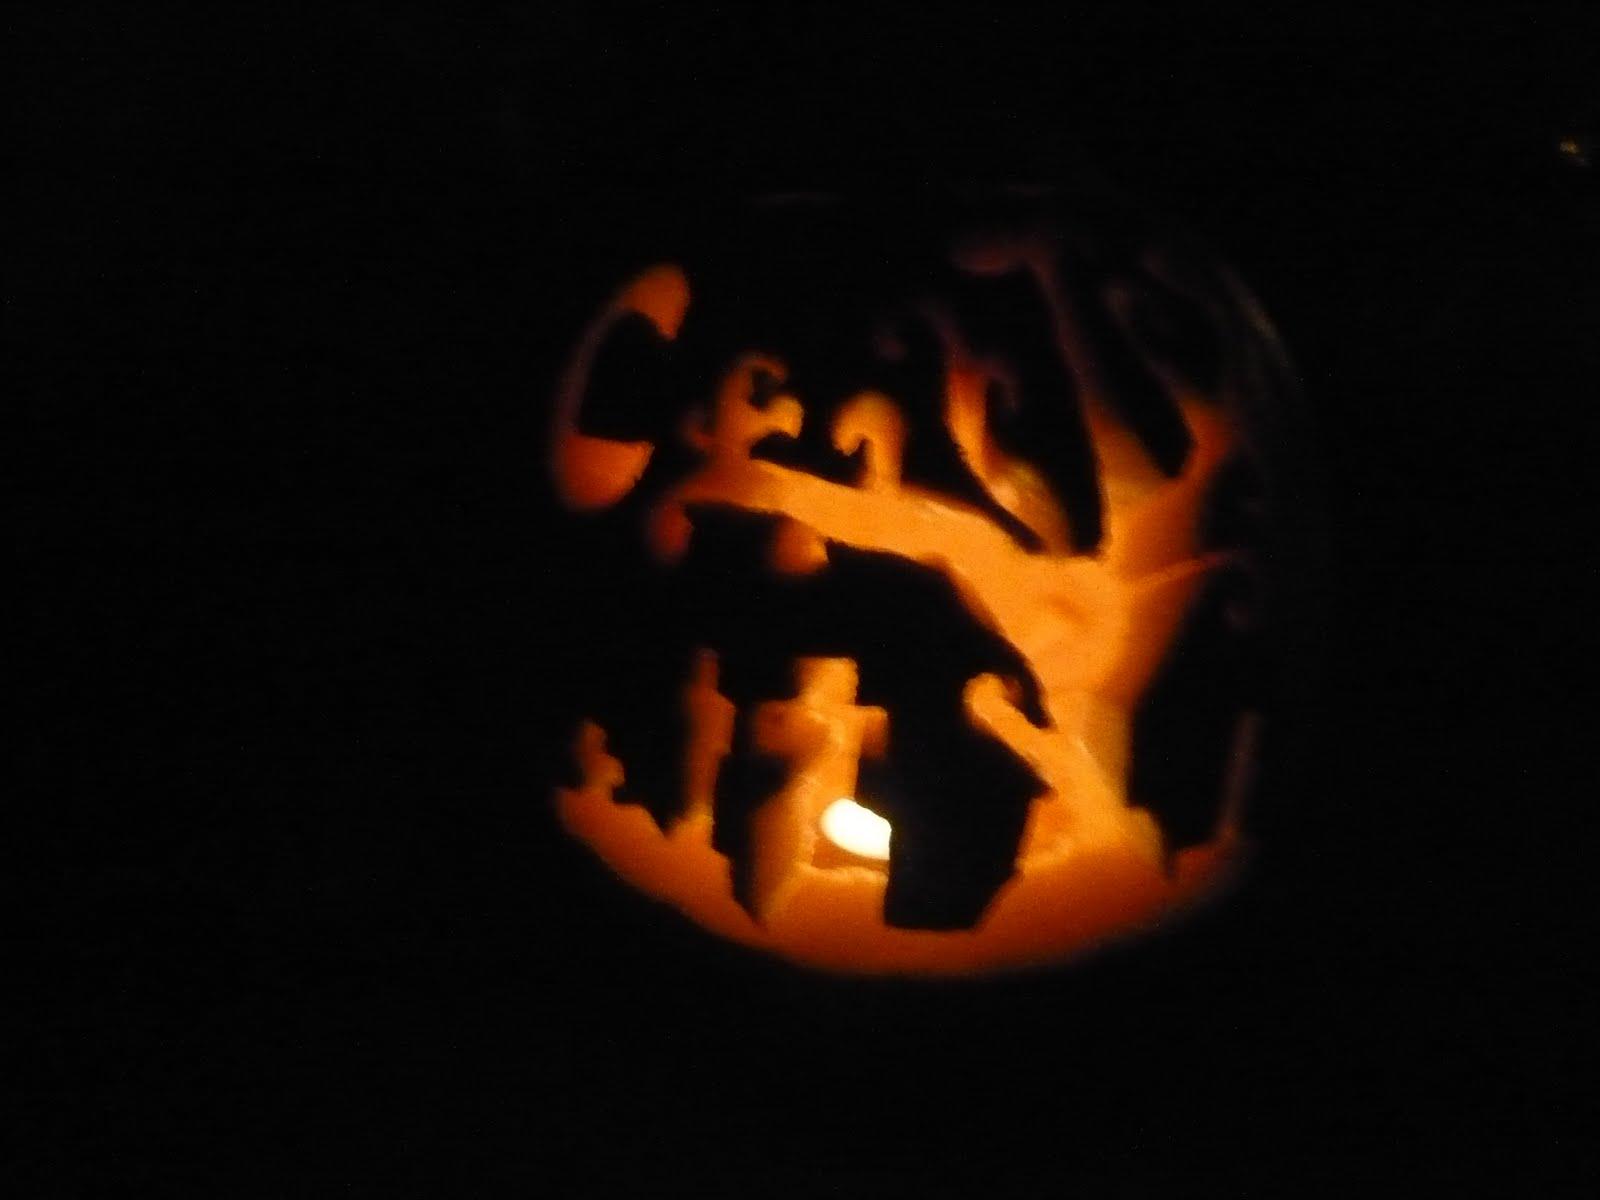 Walking dead pumpkin template spooky graveyard pumpkin